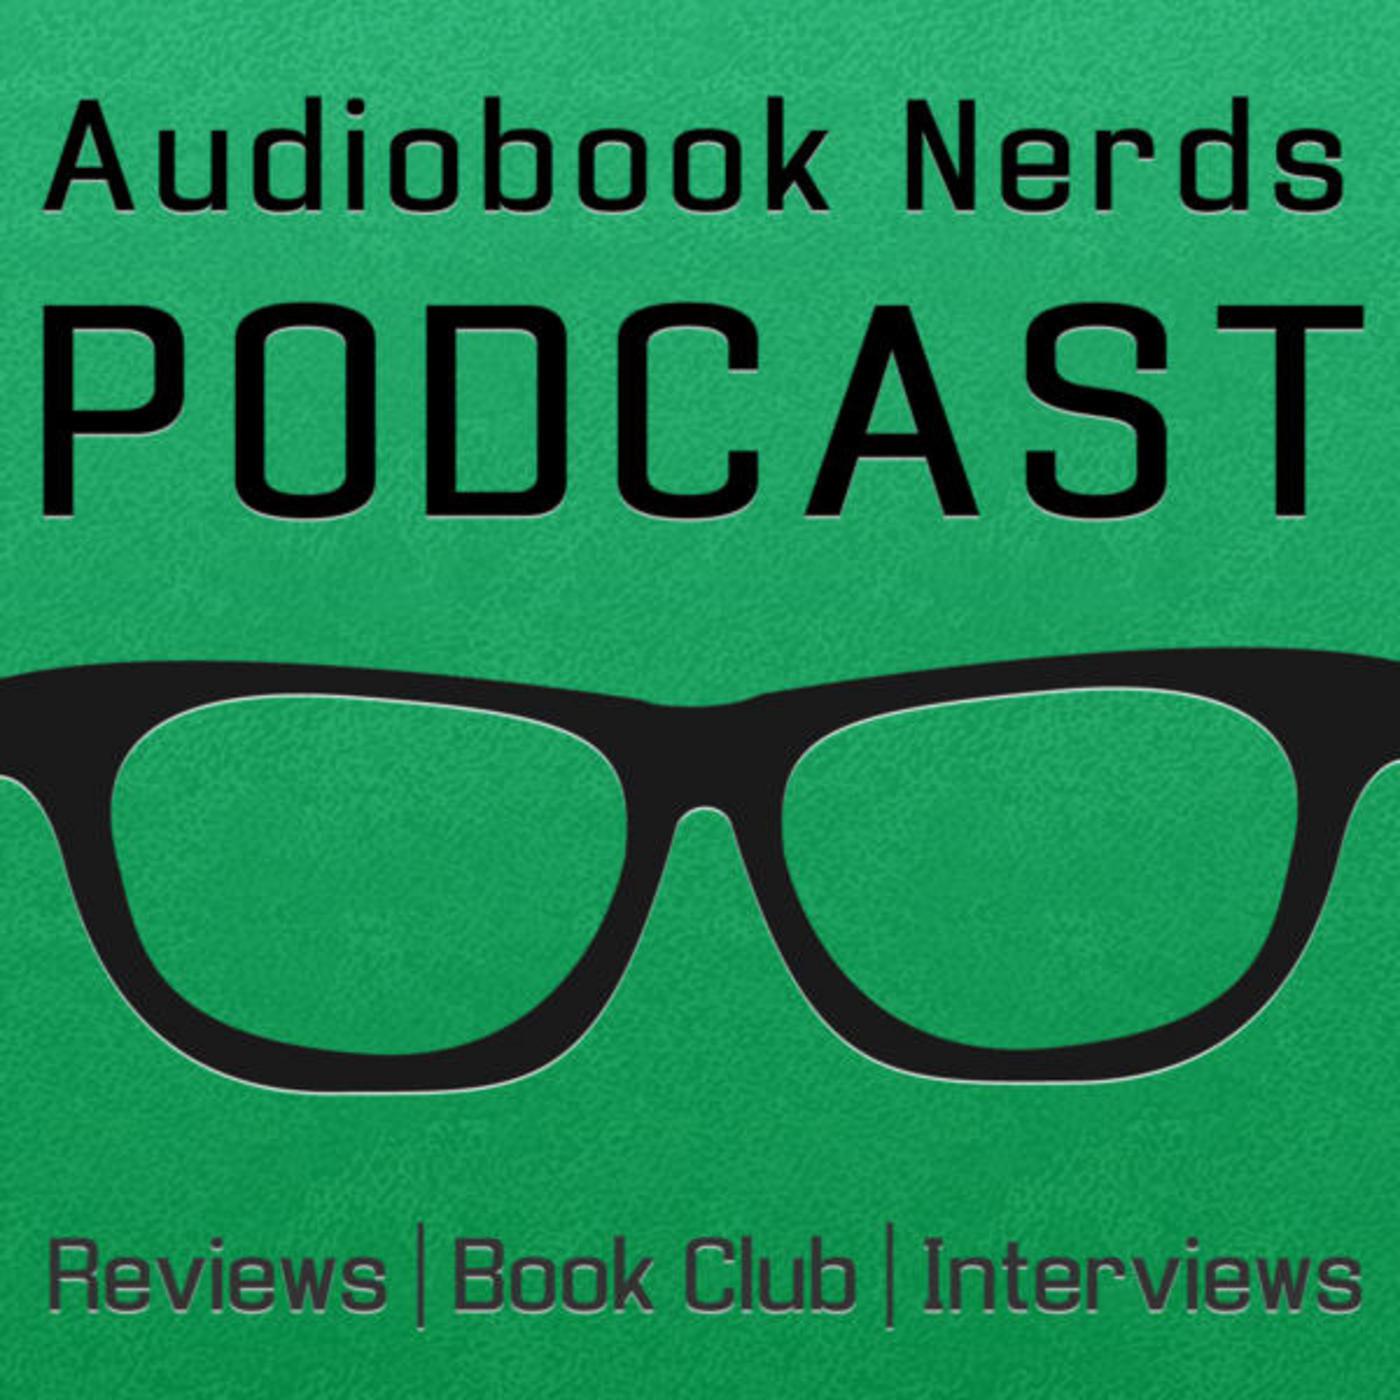 ABN 009: Scott Sigler, The Junkie Quatrain, The Great Gatsby, and Divergent